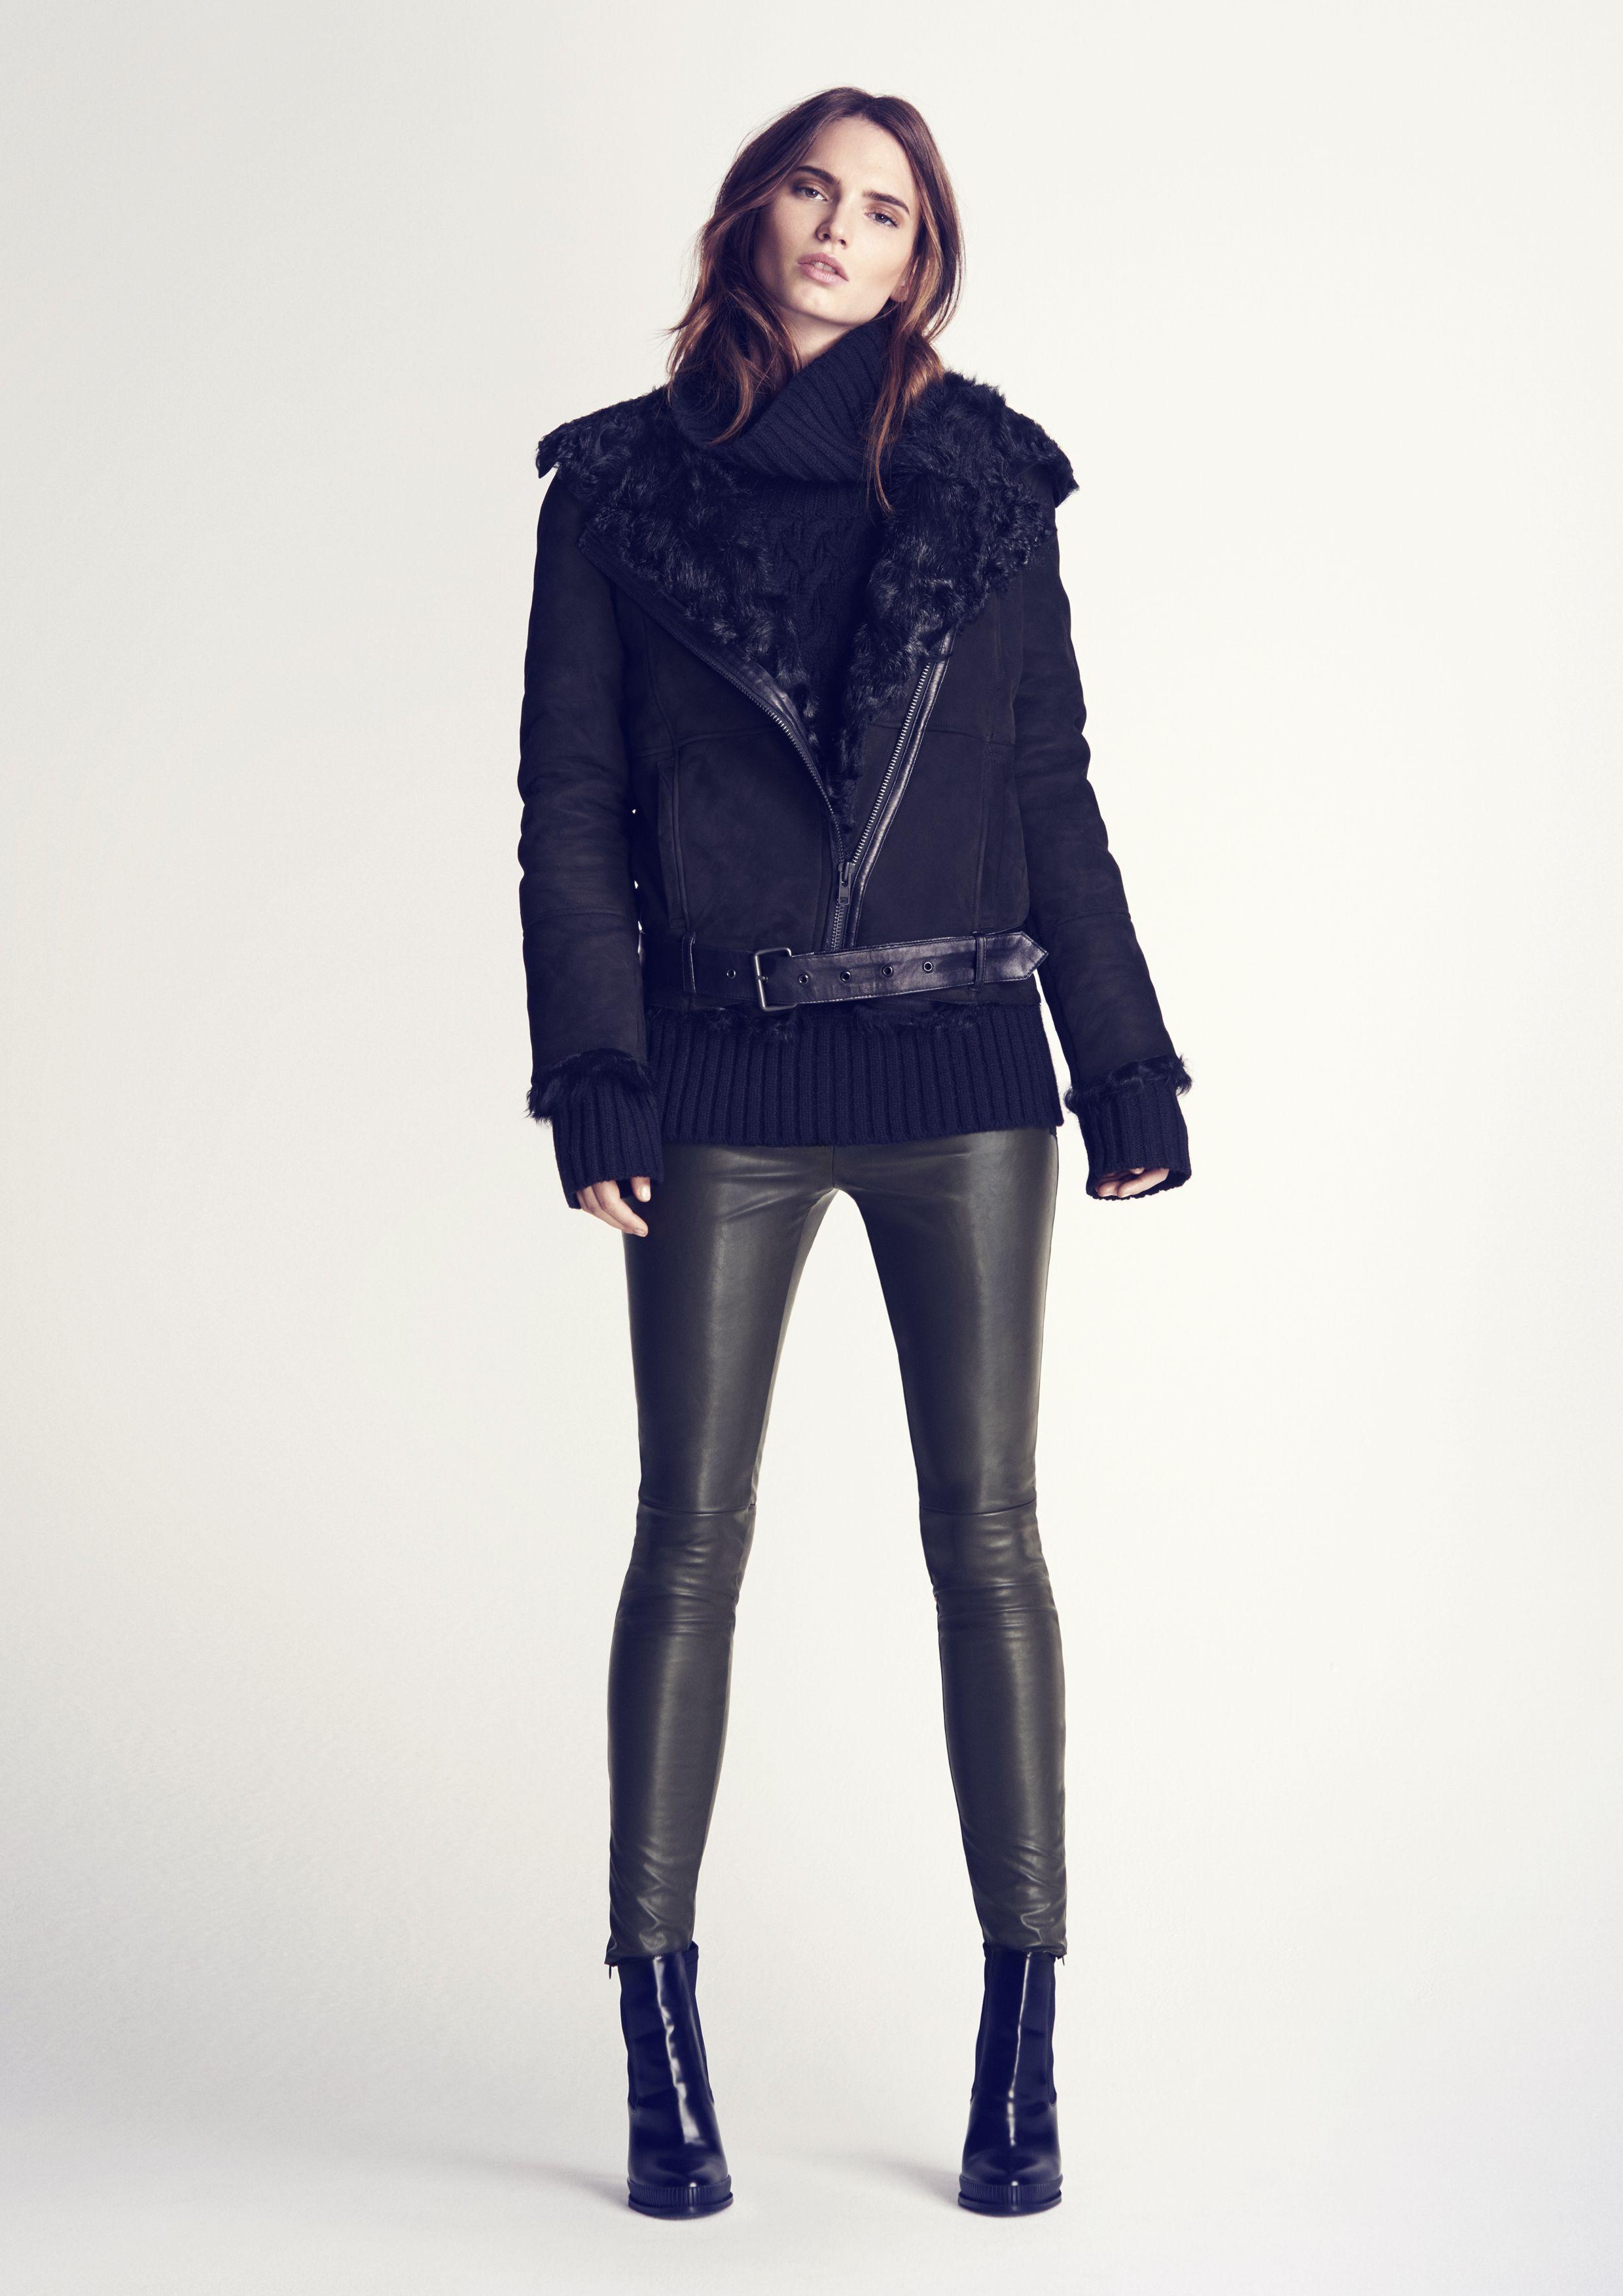 Twist & Tango Fall/Winter 2015 / Camilla Fur Jacket - Niki Turtleneck -  Arleen